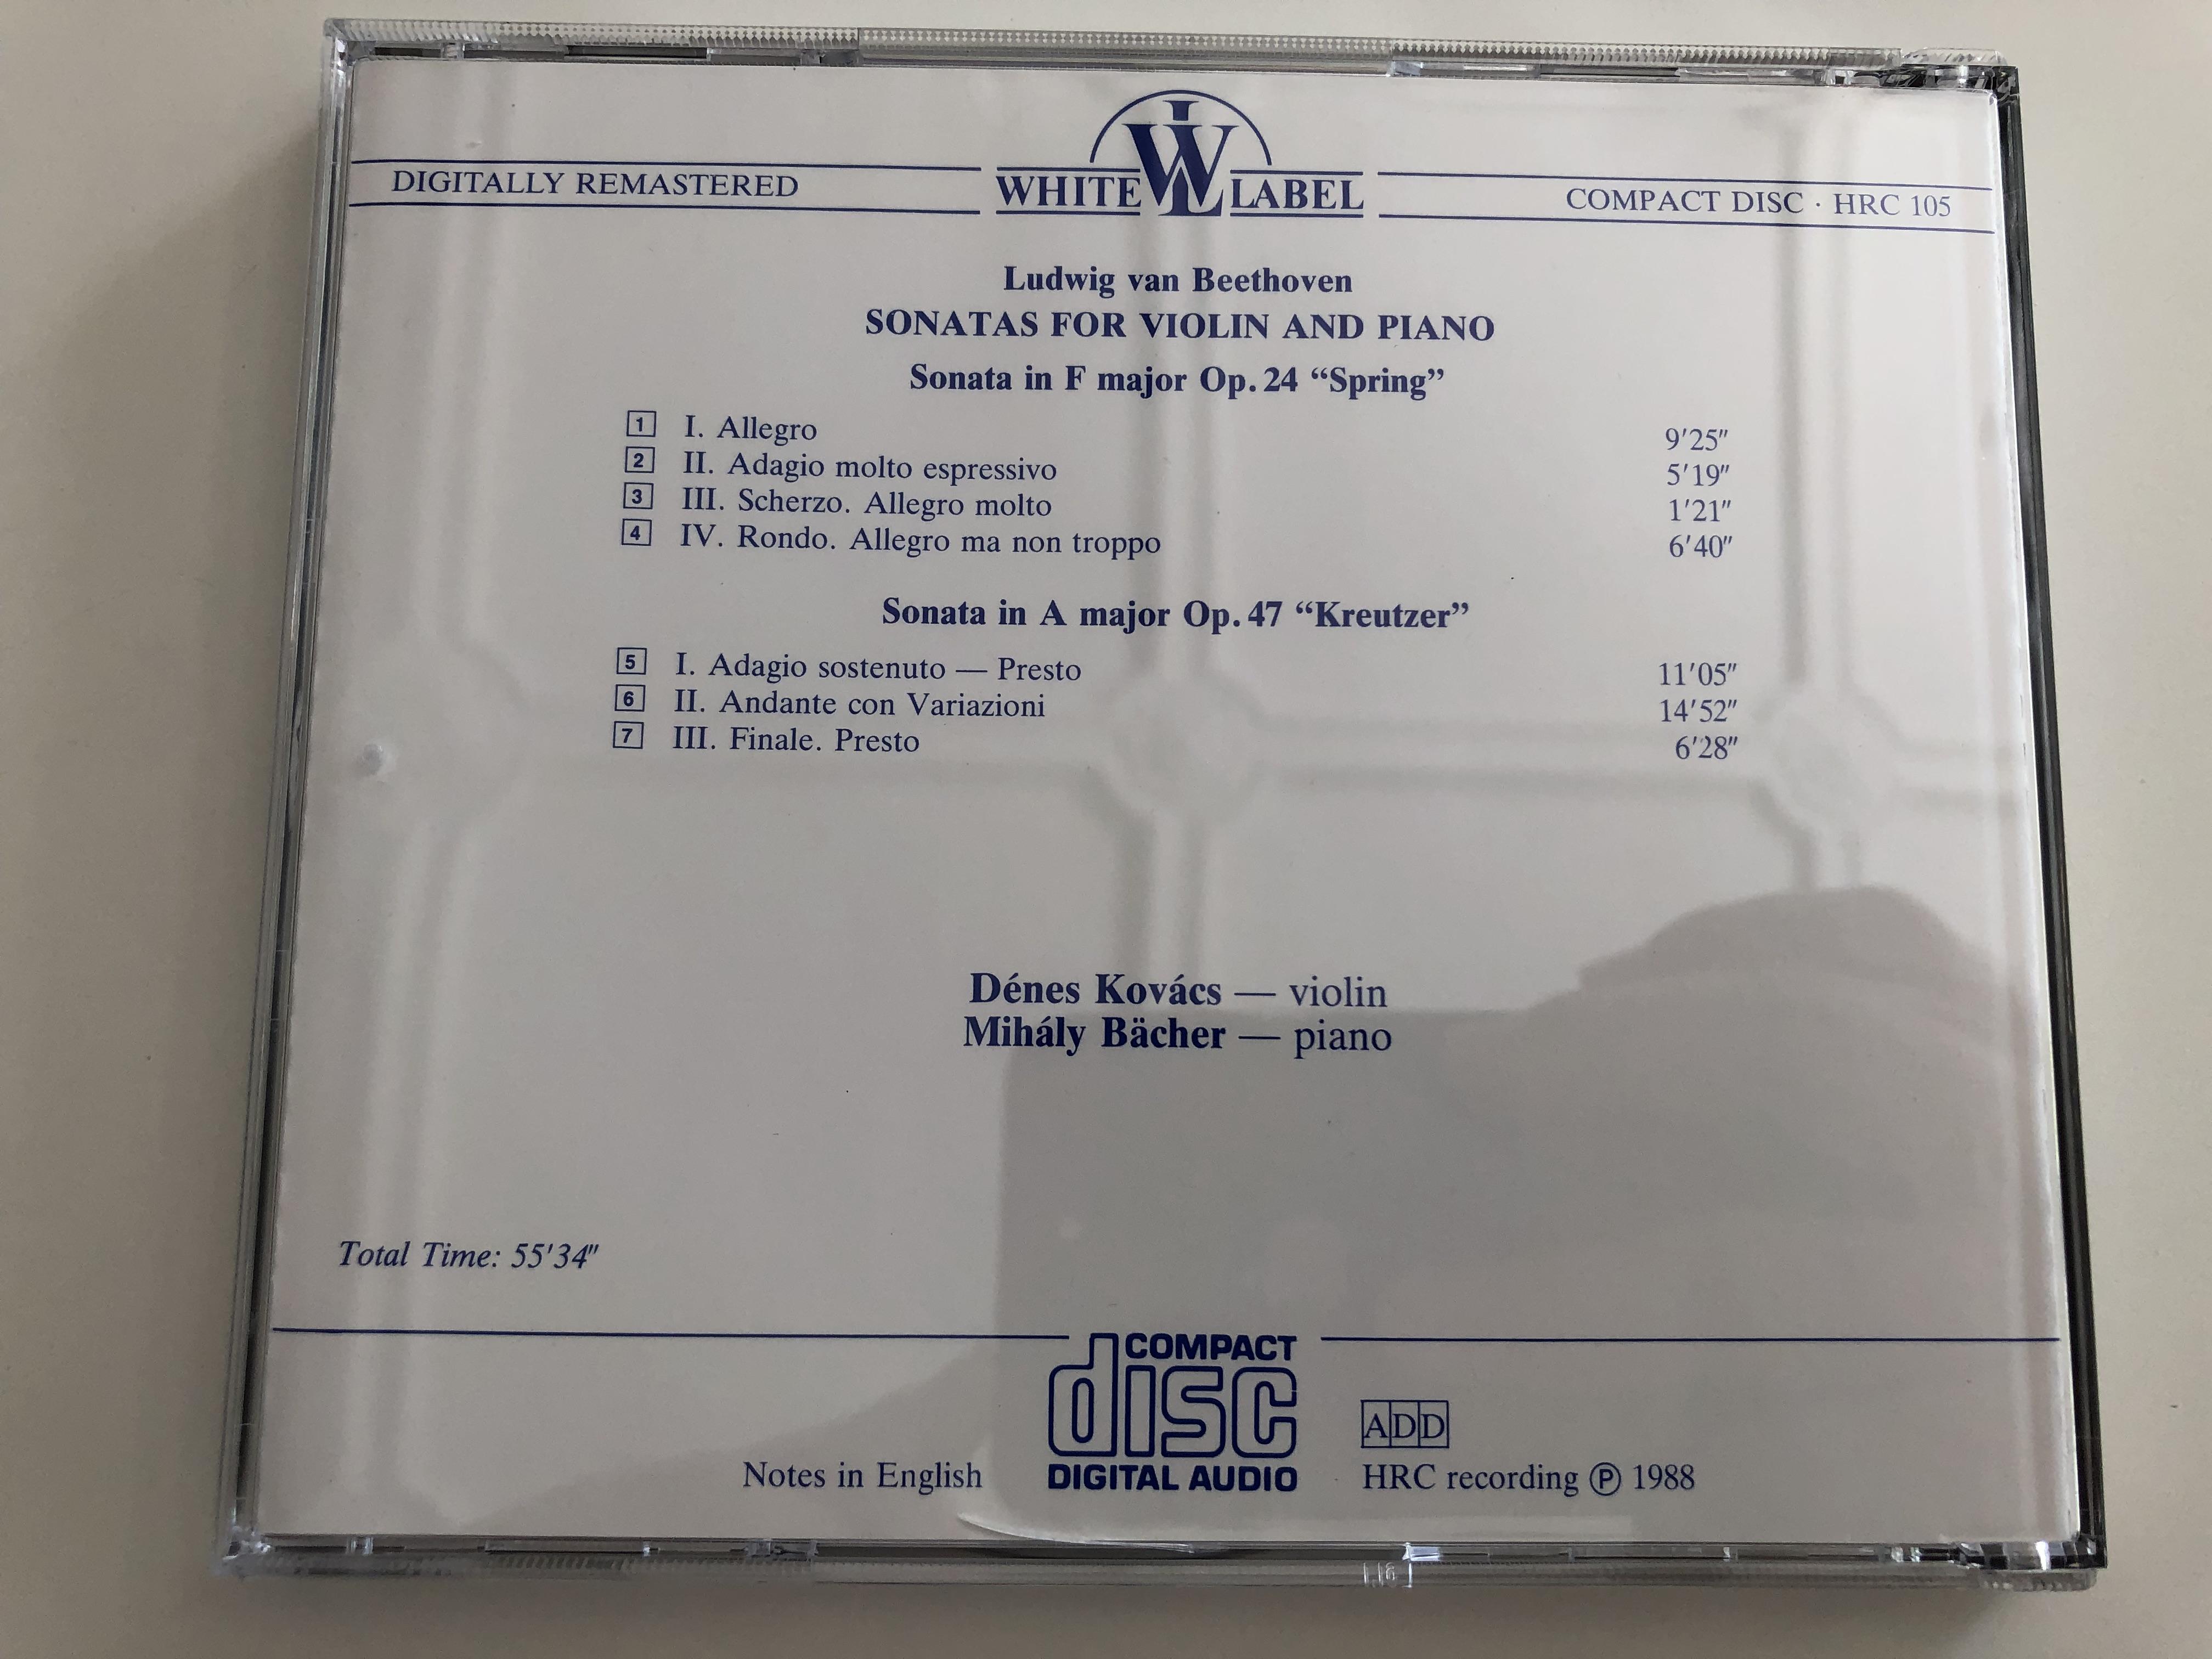 beethoven-violin-sonatas-spring-kreutzer-d-nes-kov-cs-mih-ly-b-cher-hungaroton-white-label-hrc-105-audio-cd-1988-5-.jpg